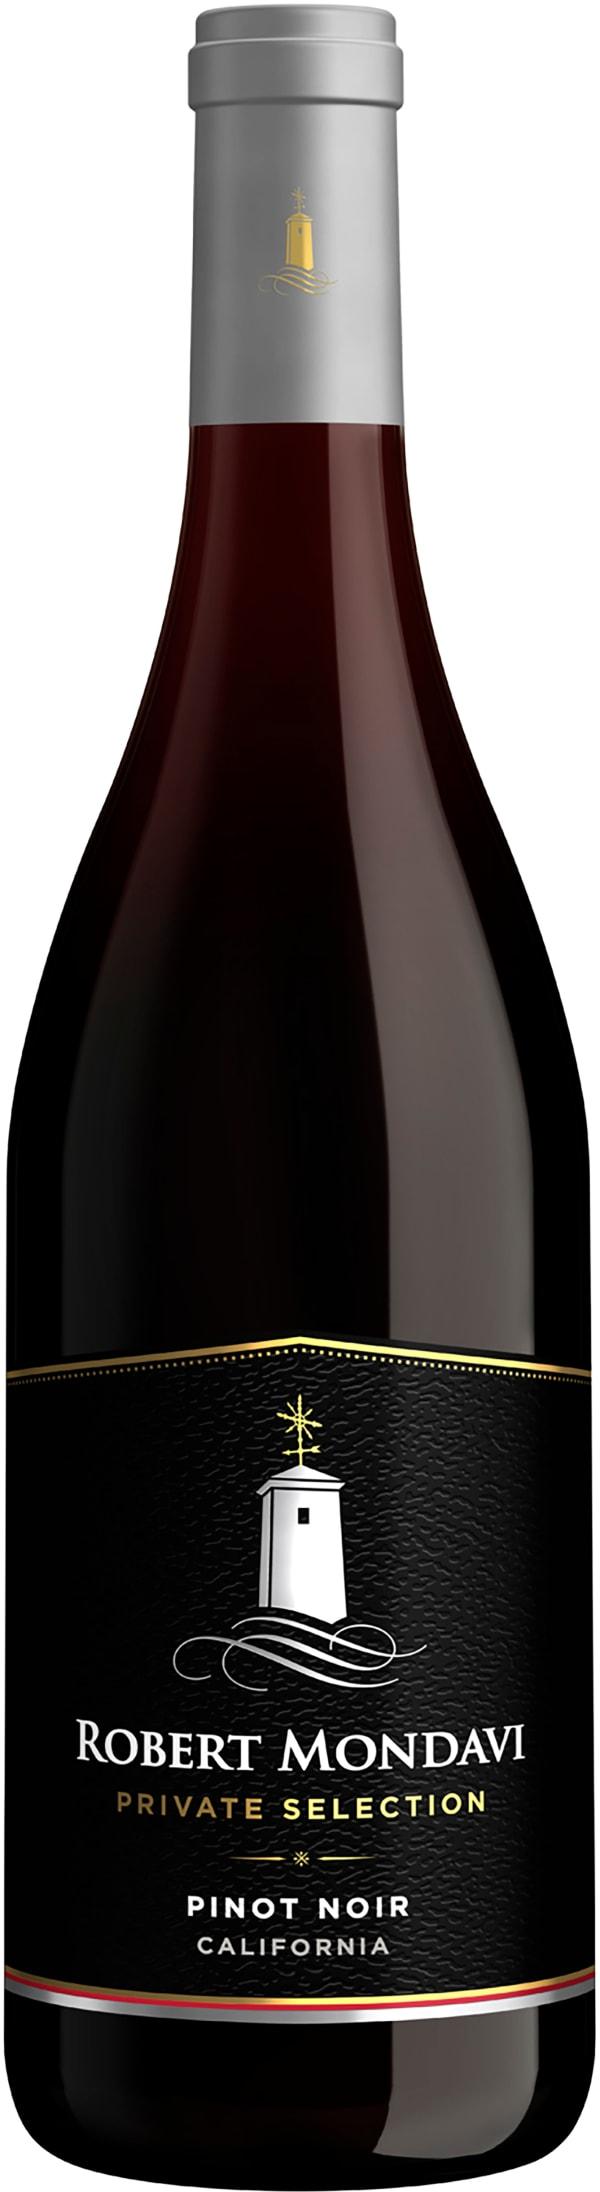 Robert Mondavi Private Selection Pinot Noir 2017